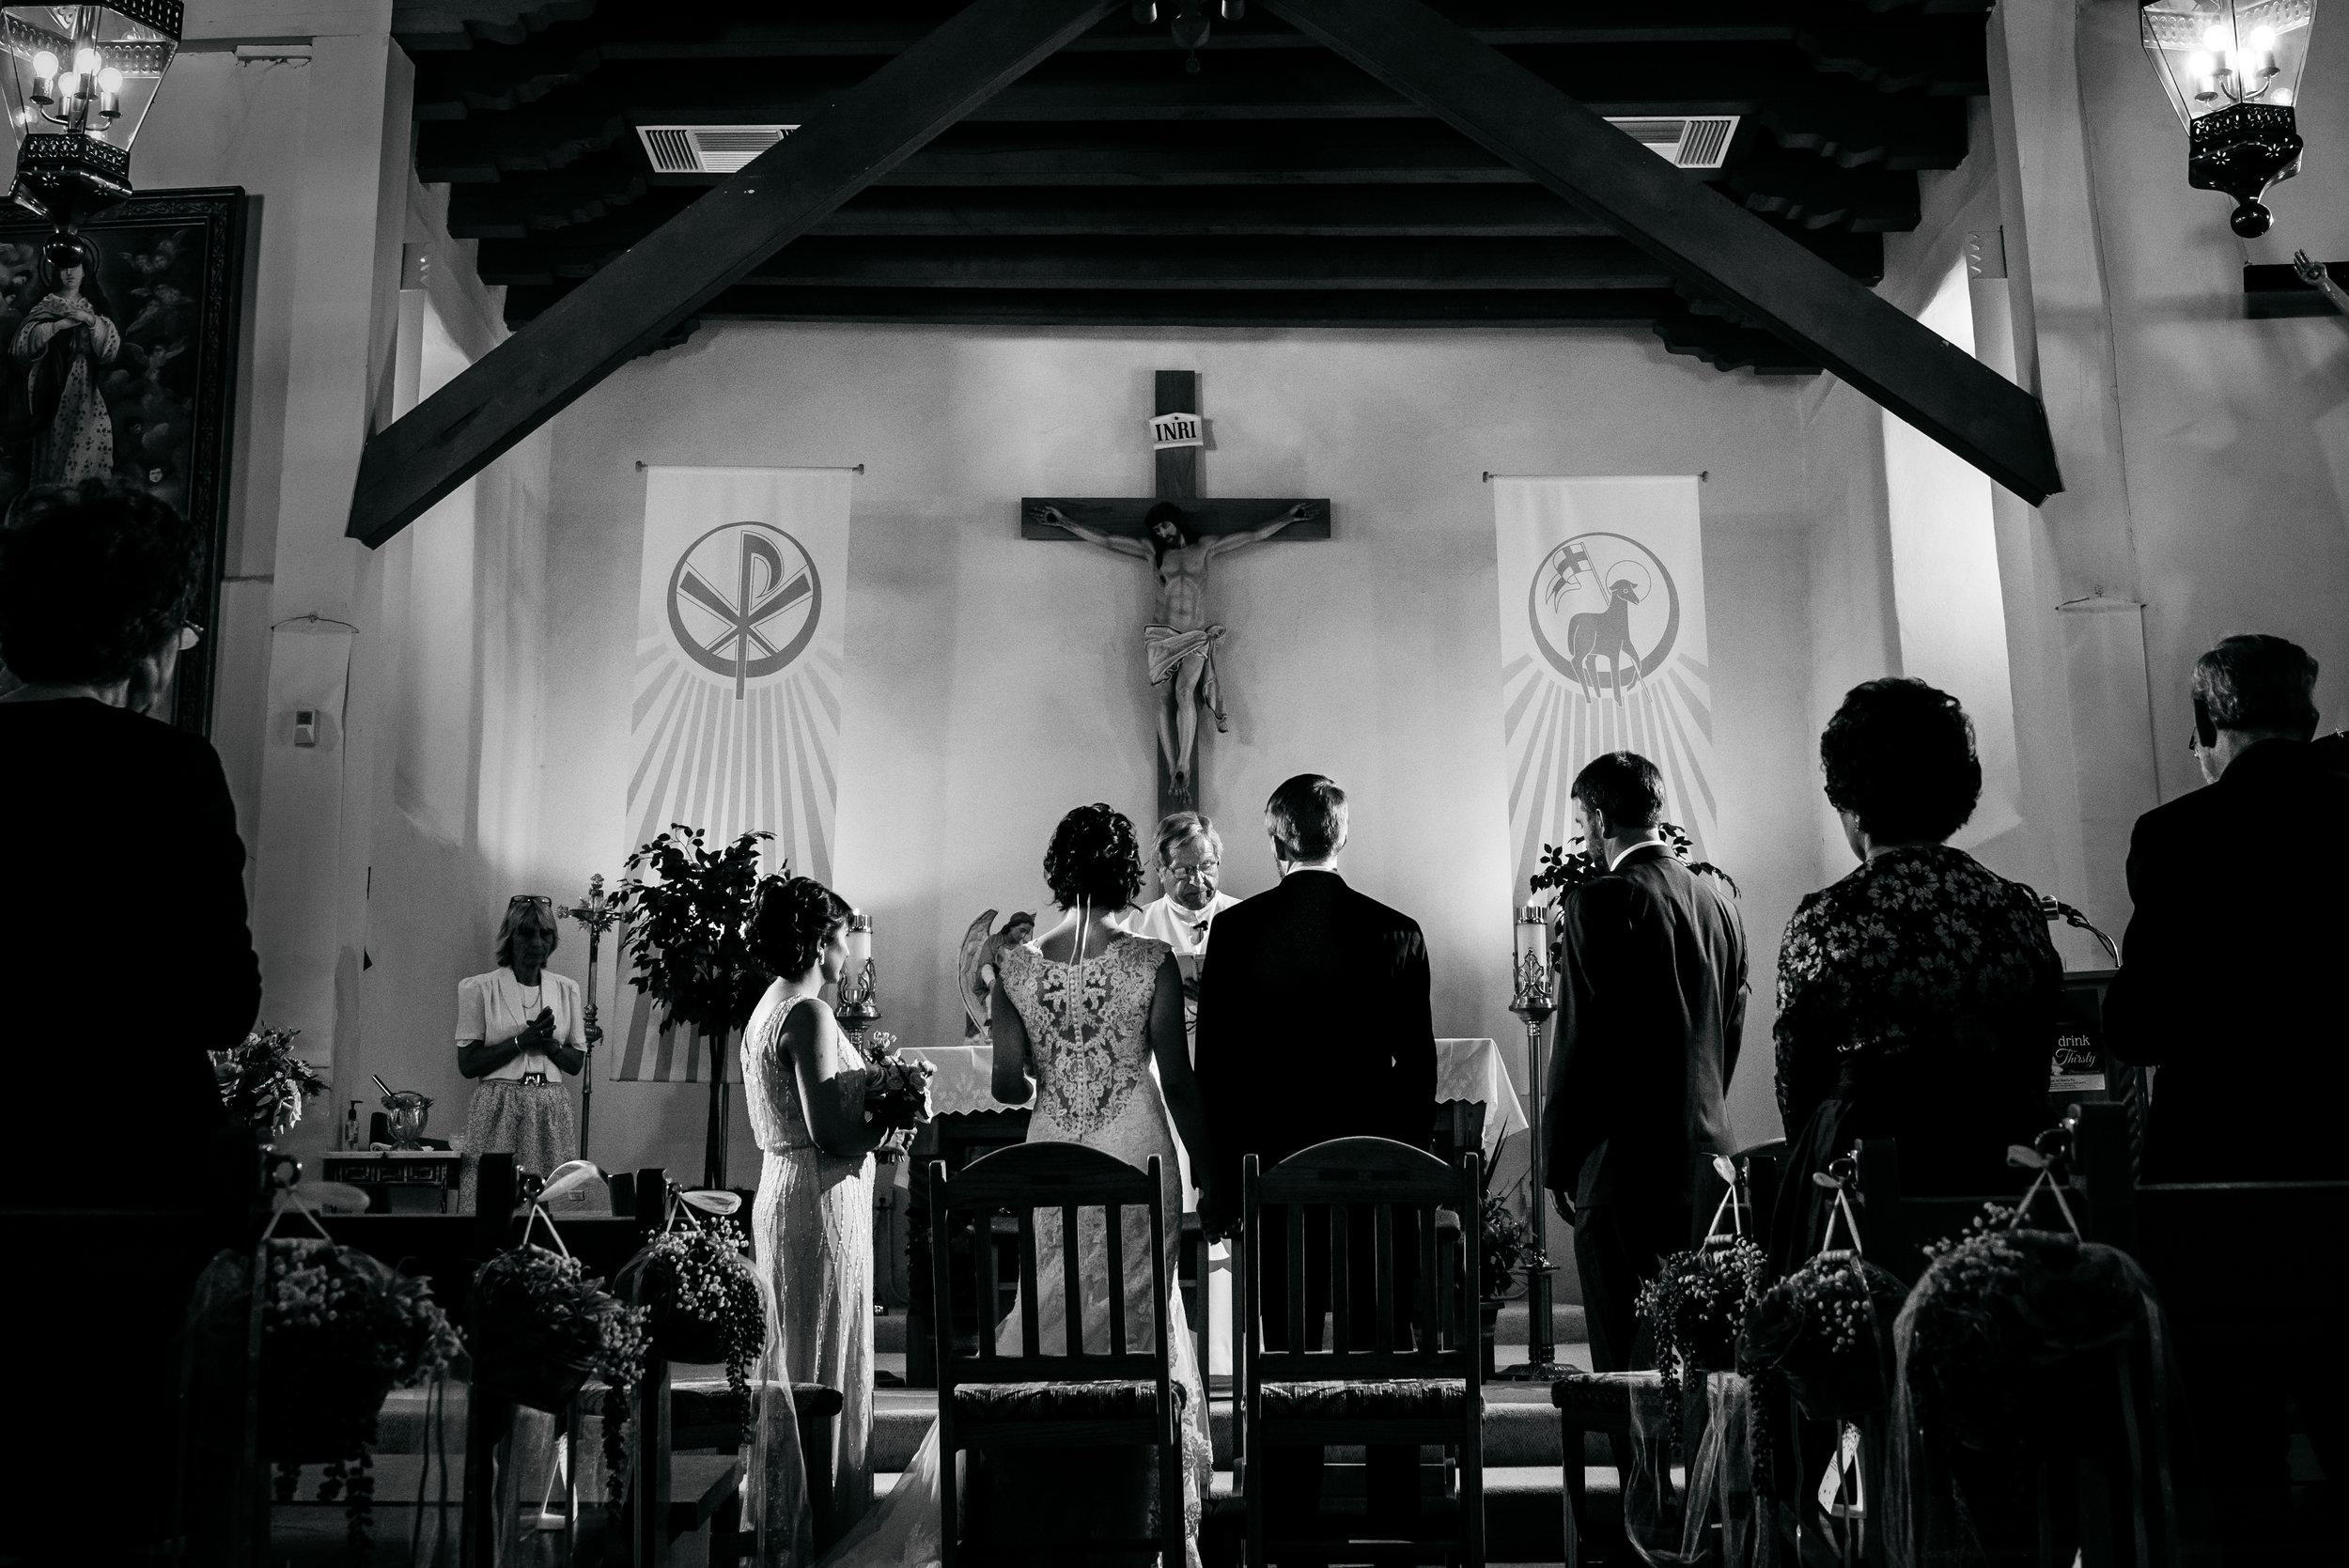 Extended_Play_Photography_Carmella_Wedding-8.jpg